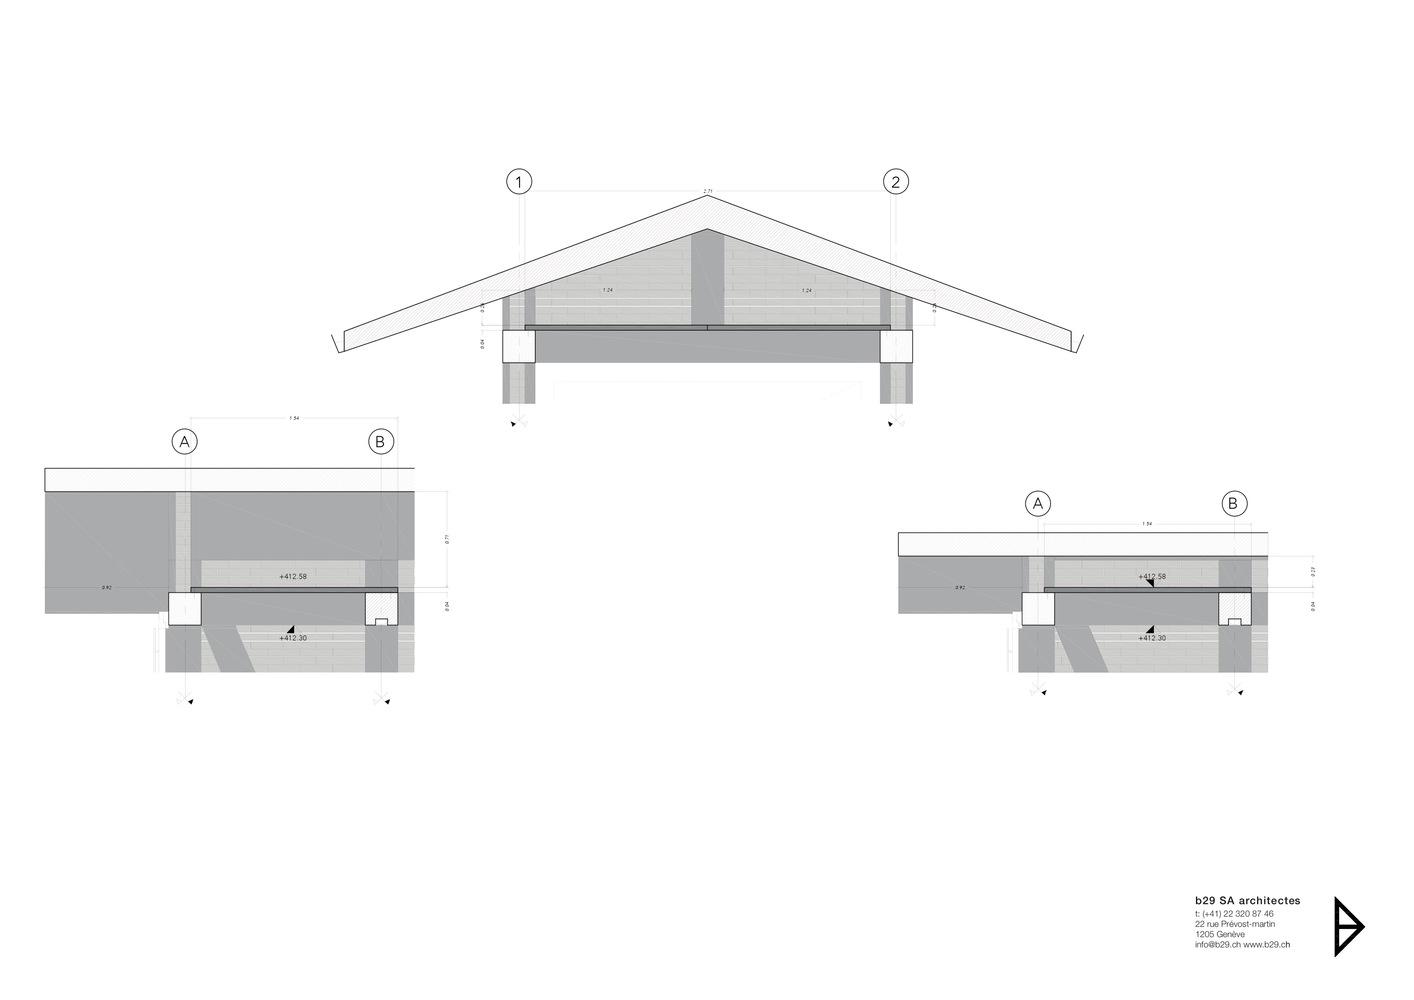 Схема креплений гаража с навесом